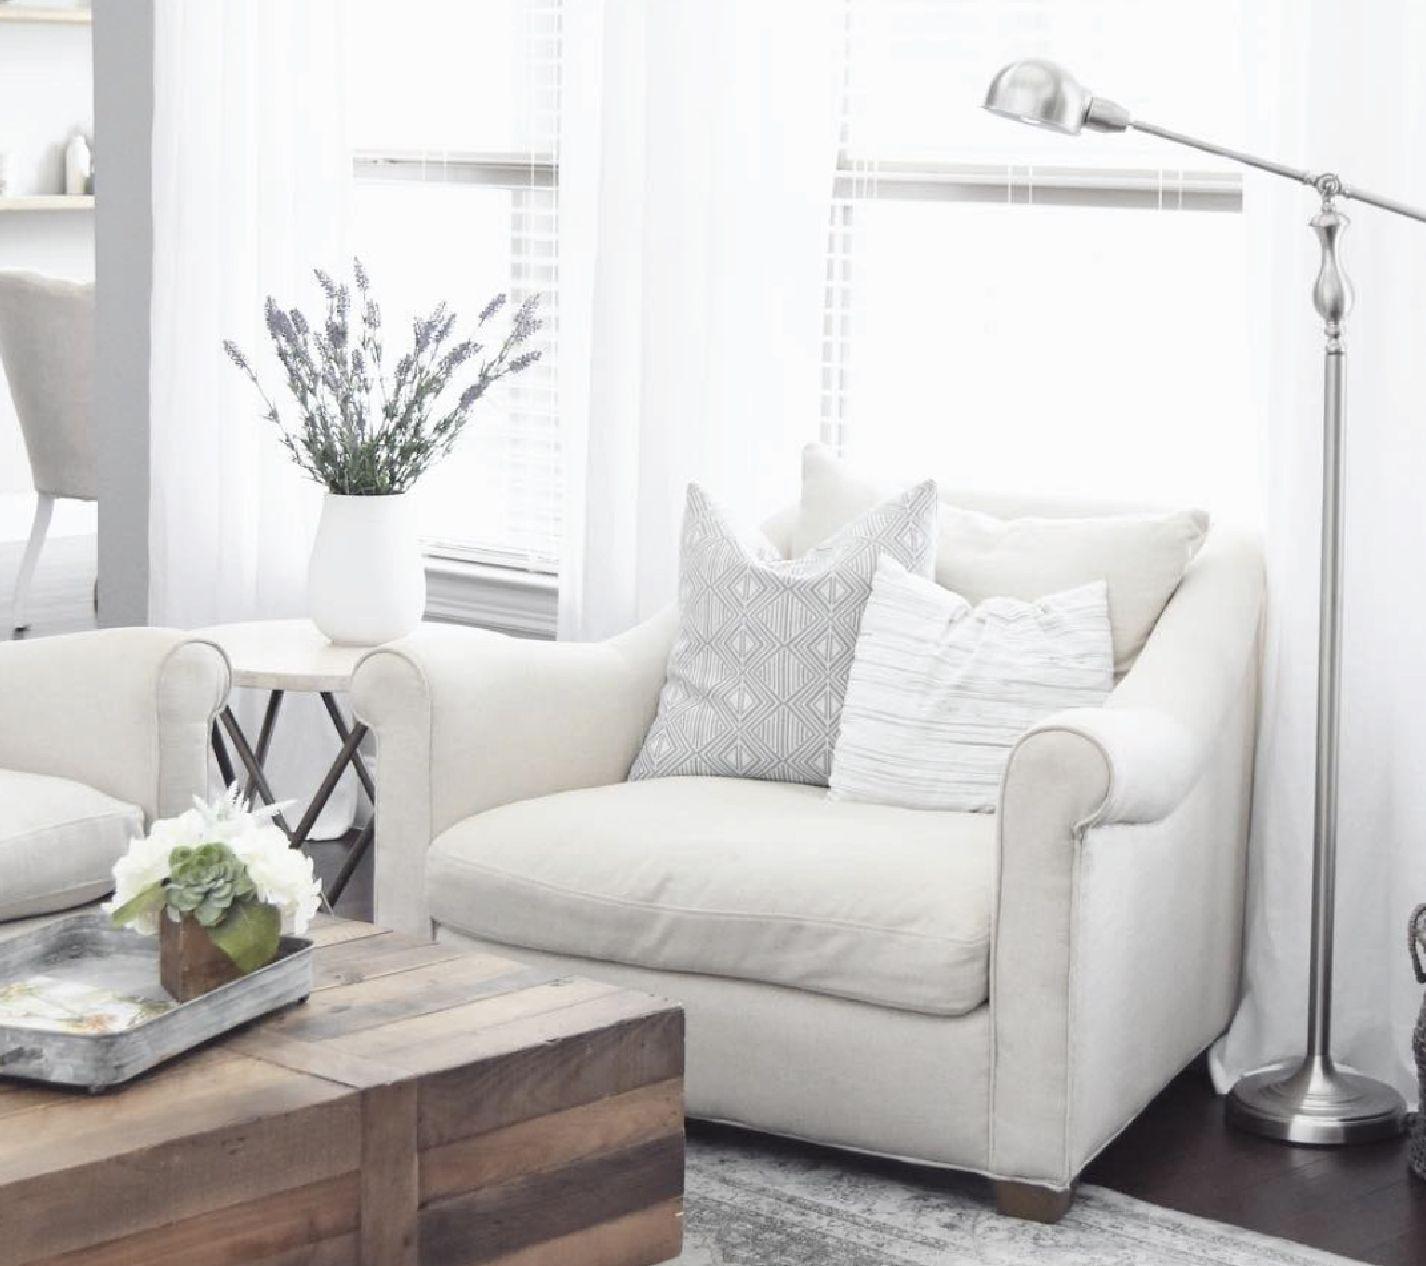 Layla grayce blog luxury home decor u fashion lg blog